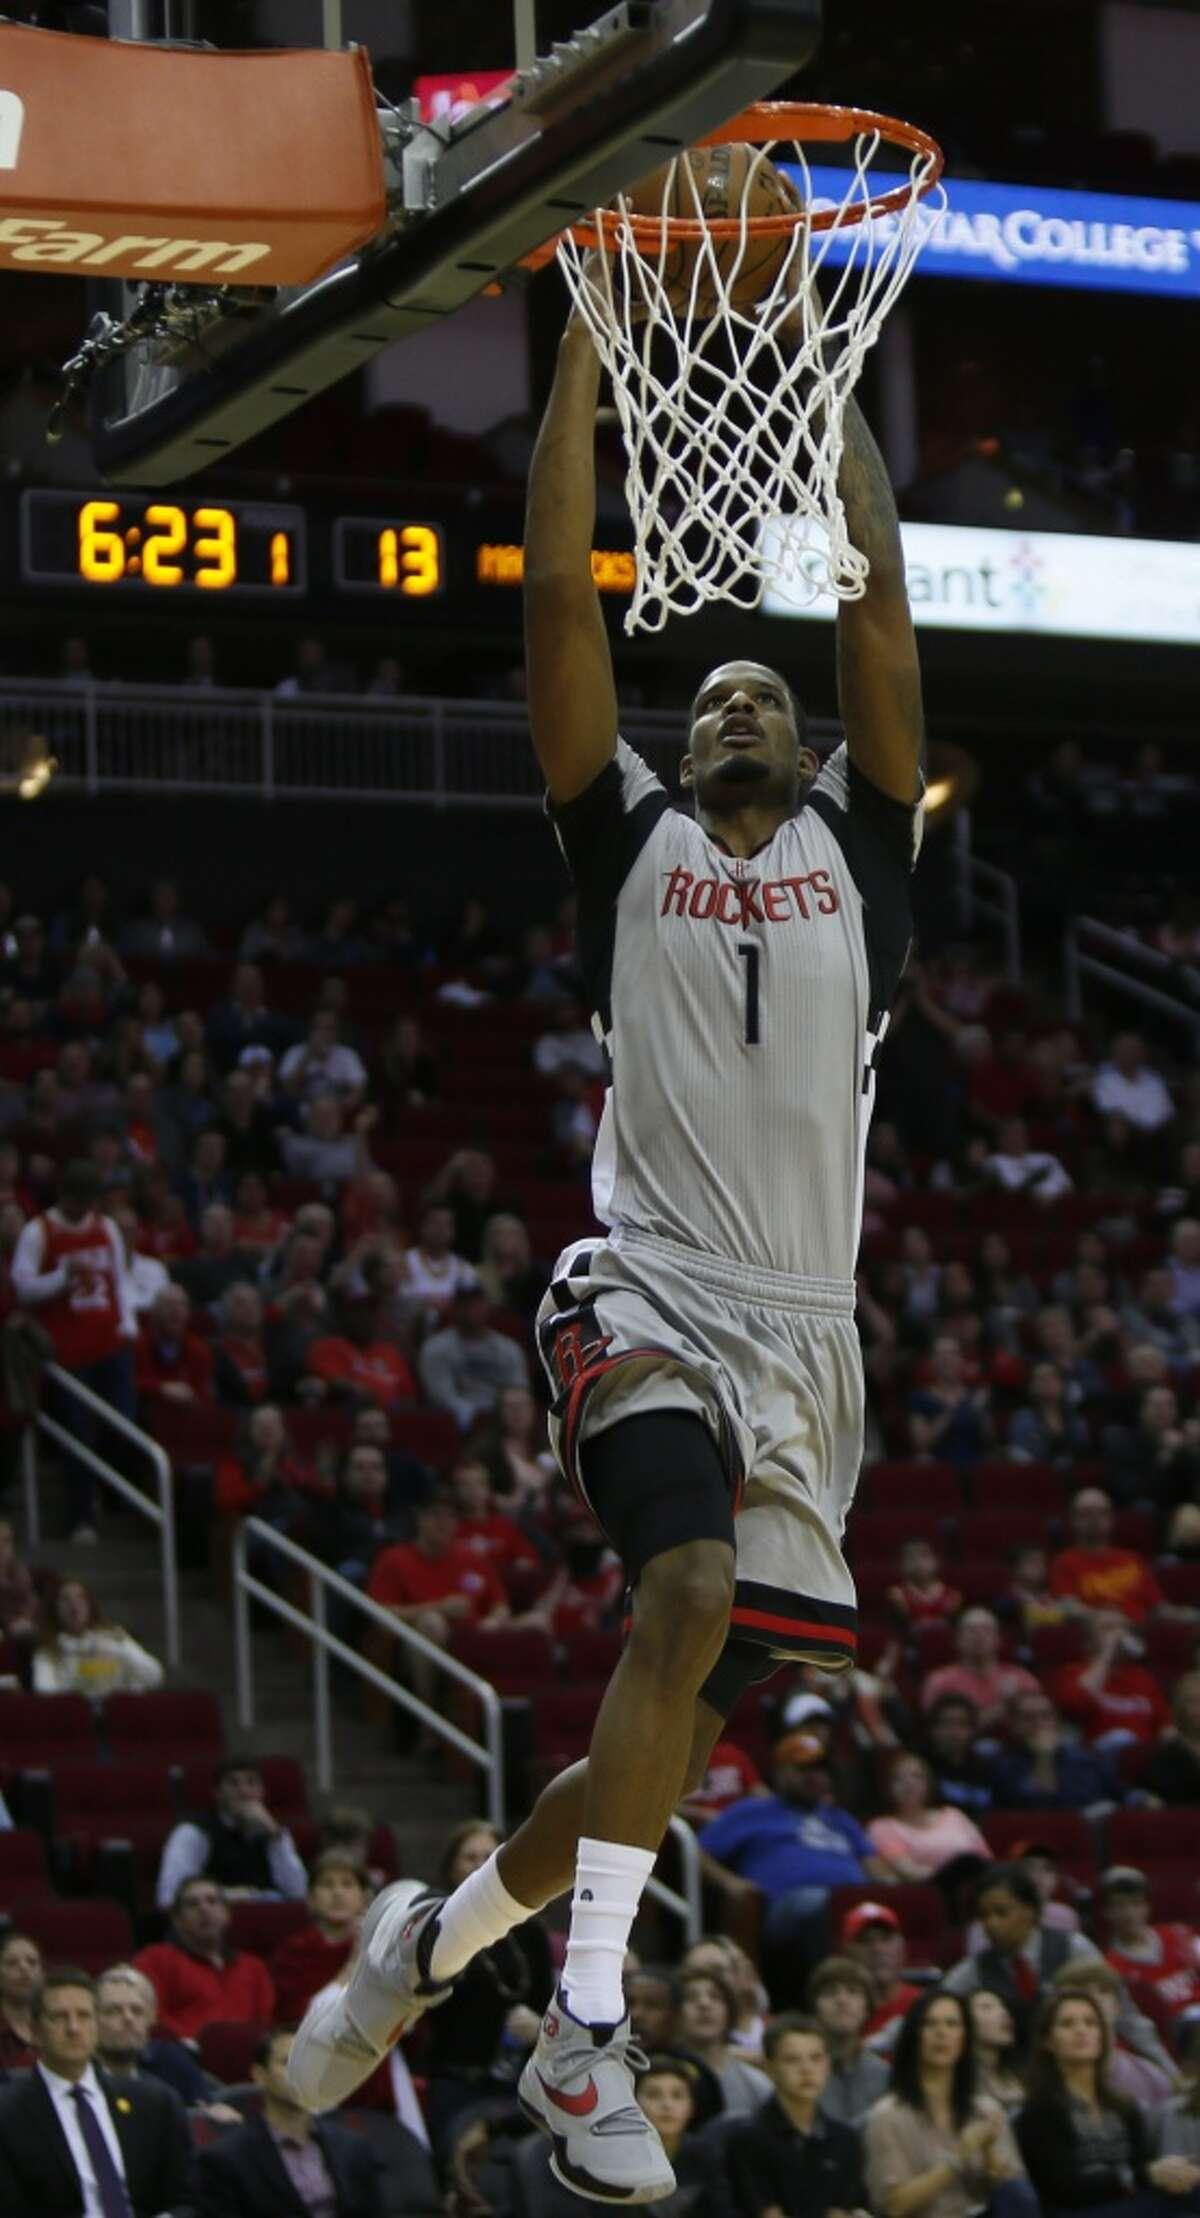 Houston Rockets forward Trevor Ariza (1) scores early in the game against the Dallas Mavericks, Sunday, Jan. 24, 2016, in Houston. ( Marie D. De Jesus / Houston Chronicle )